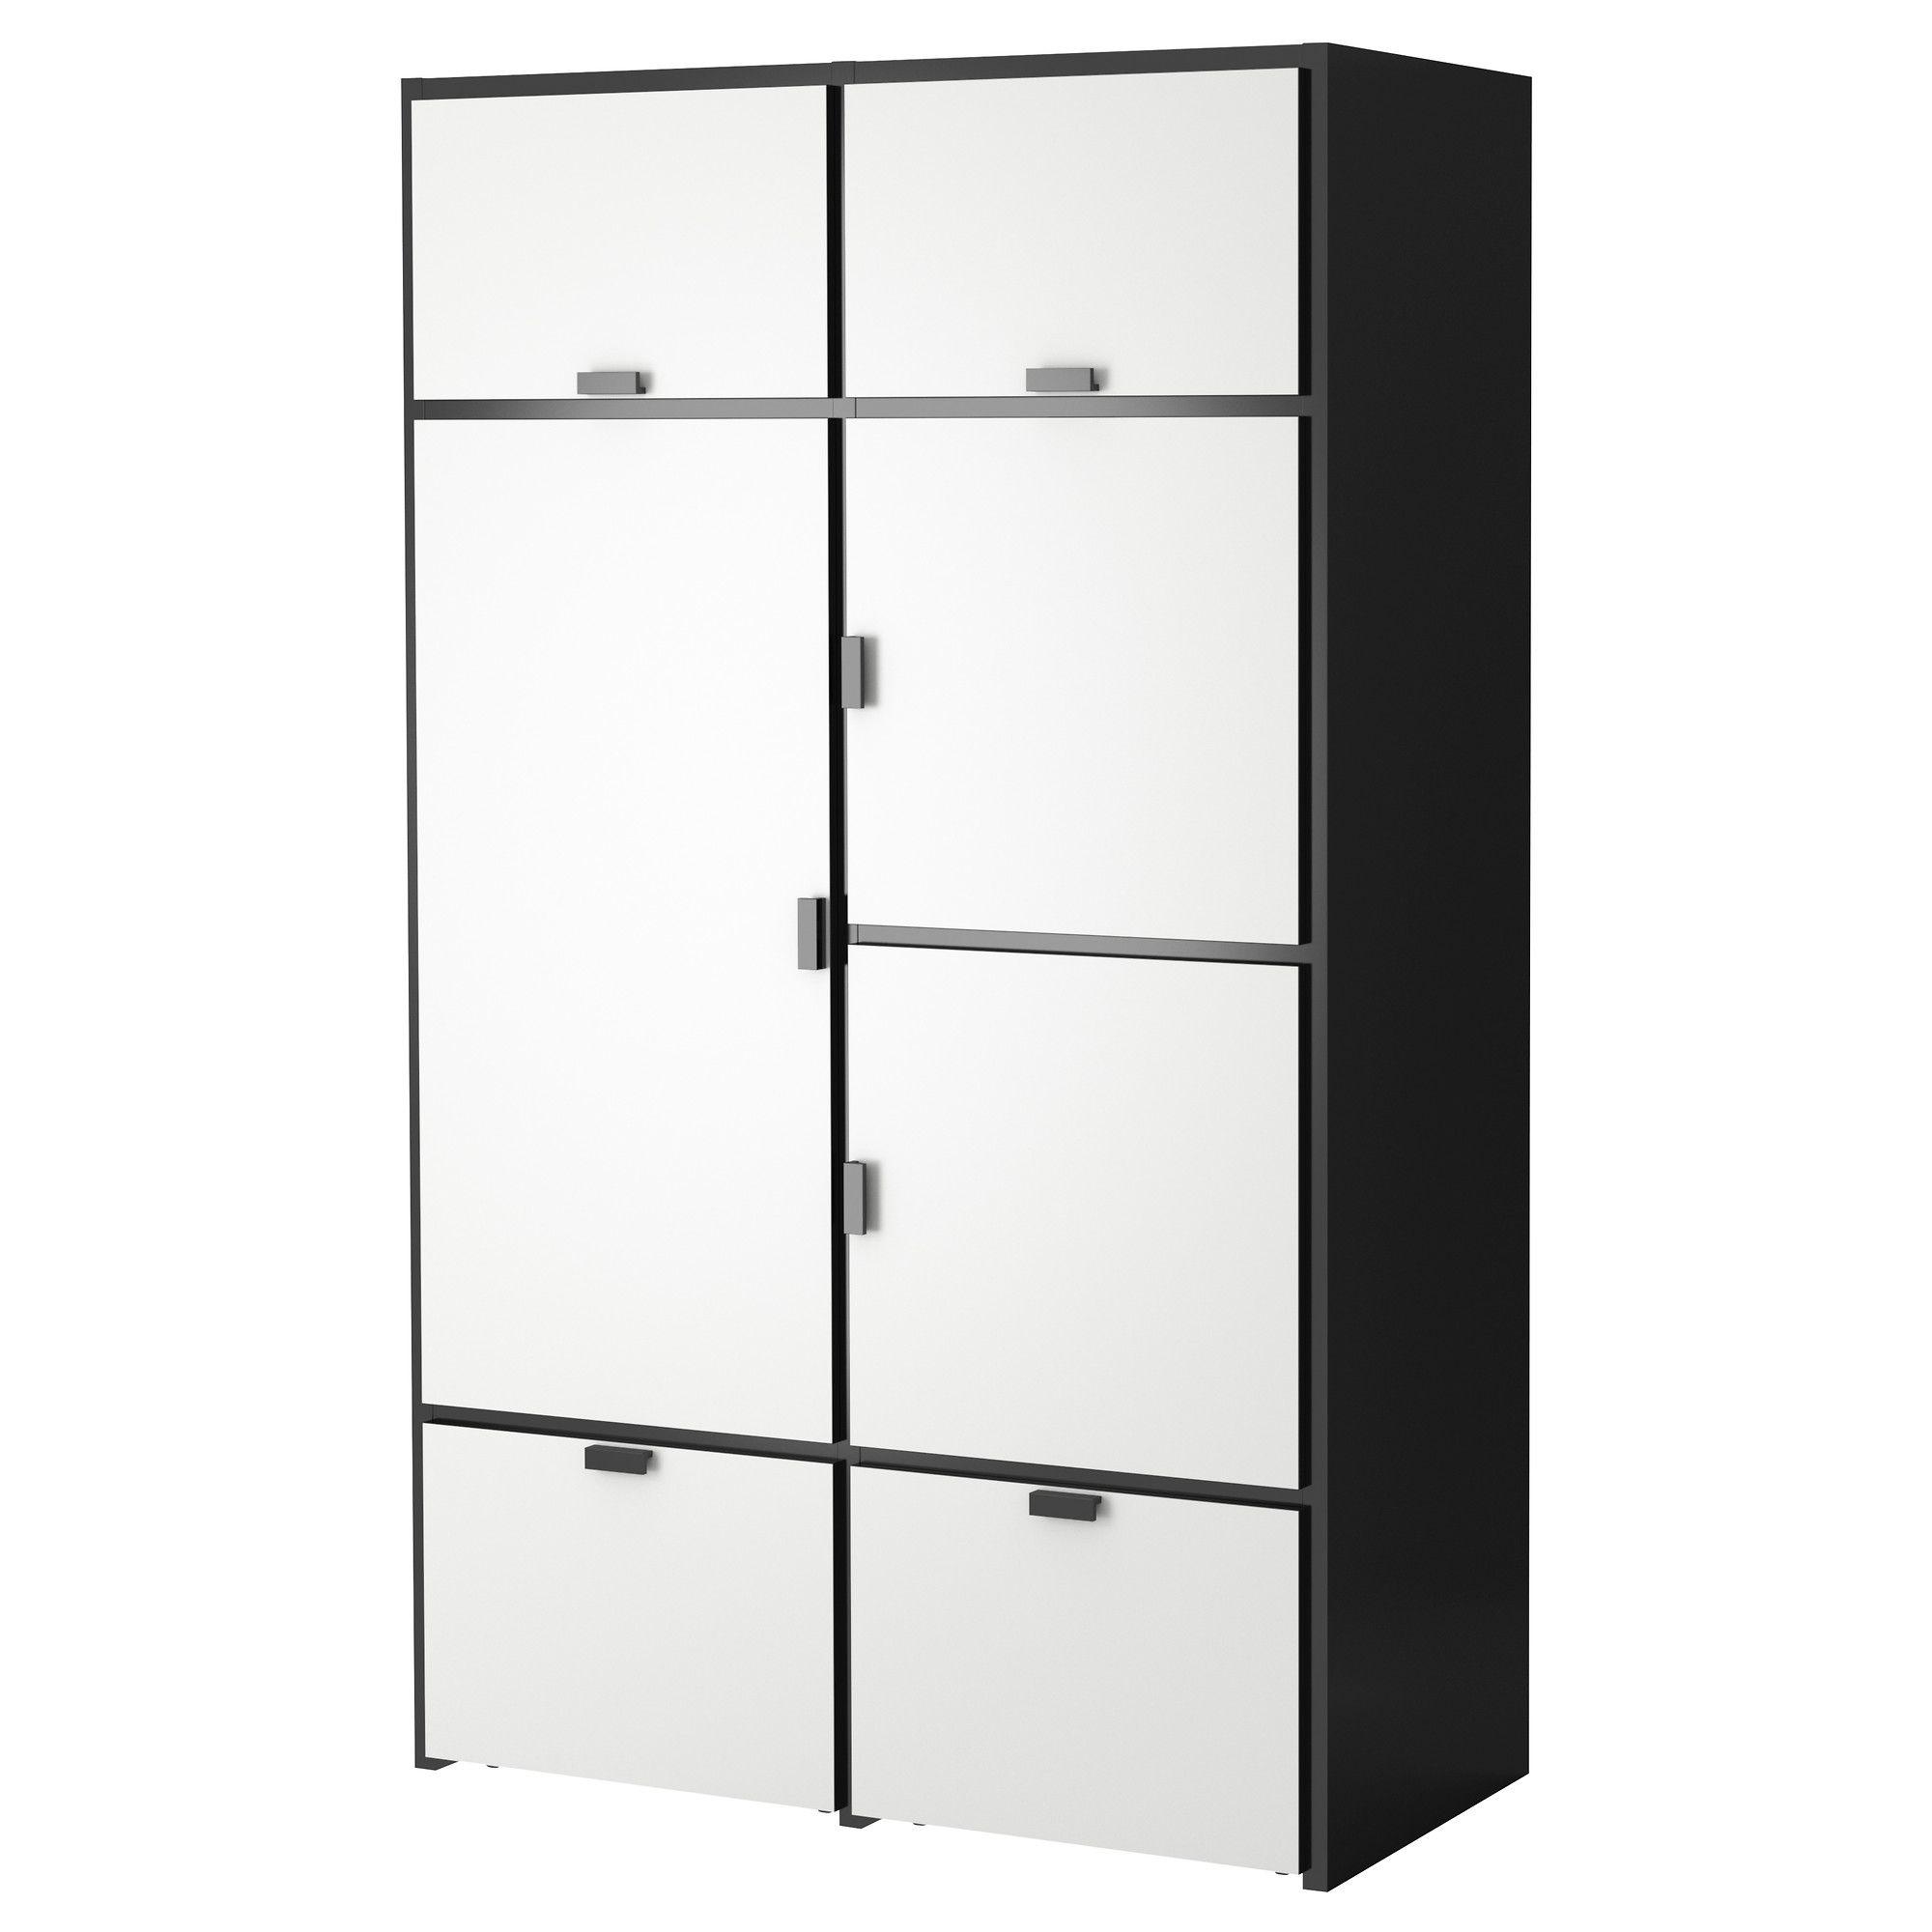 Ikeaus odda wardrobe